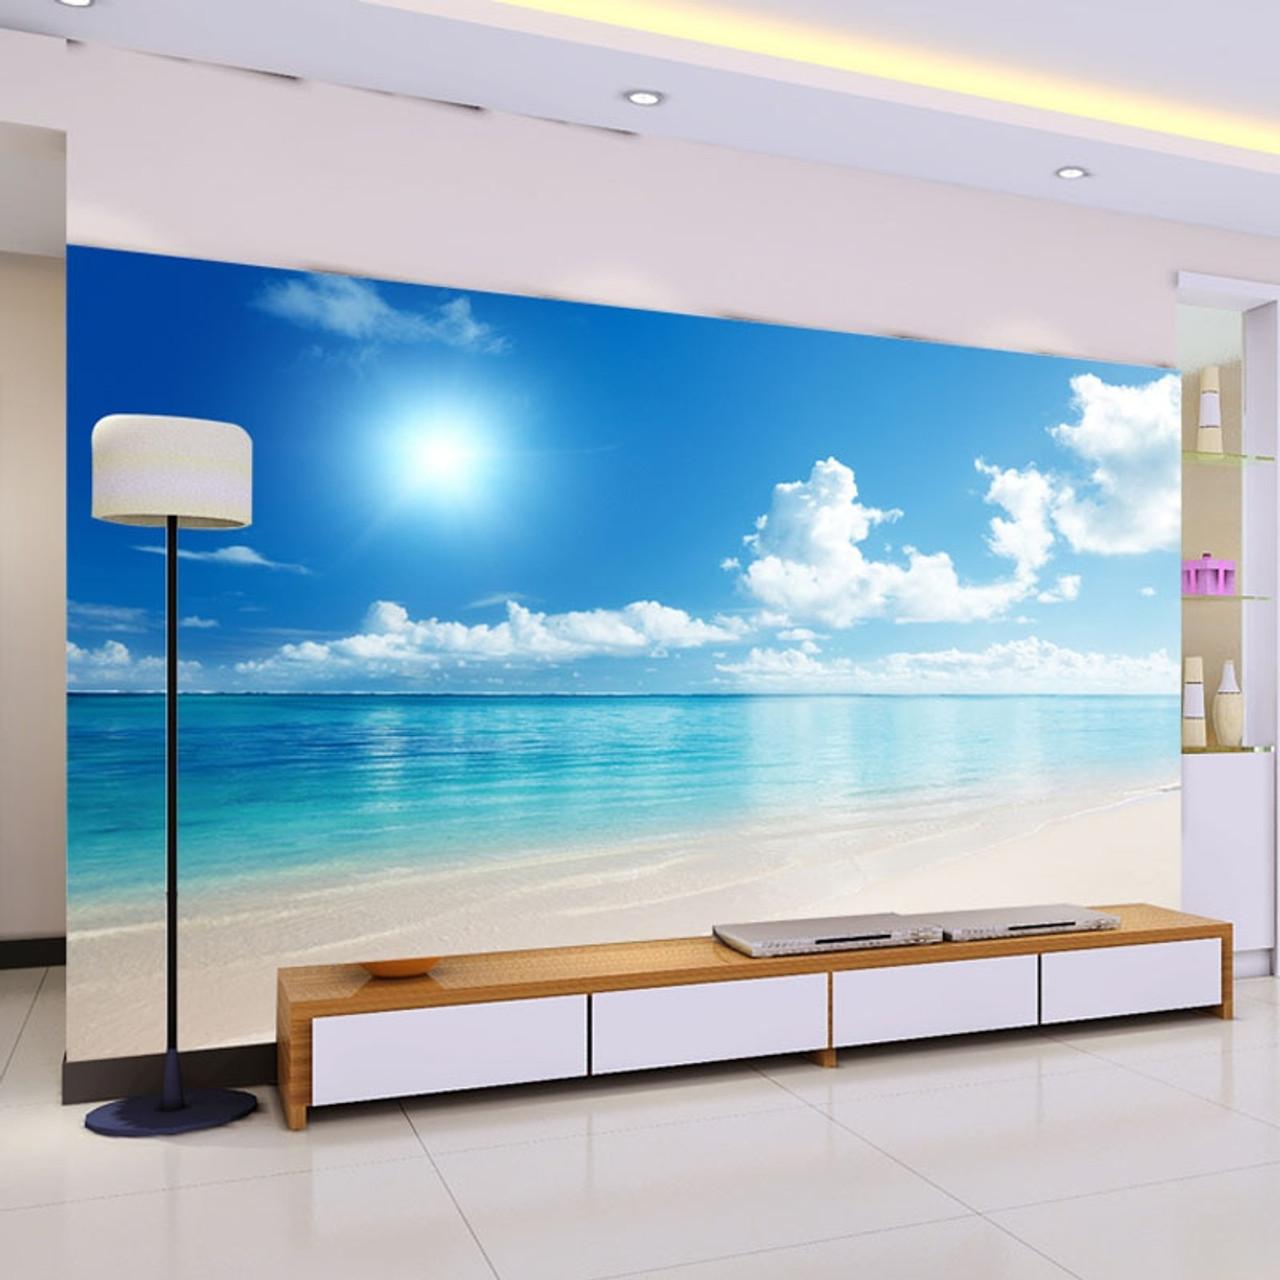 Custom Mural Wallpaper 3d Ocean View Blue Sky And Clouds Beach Living Room Bedroom Wall Covering Wallpaper Papel De Parede 3d